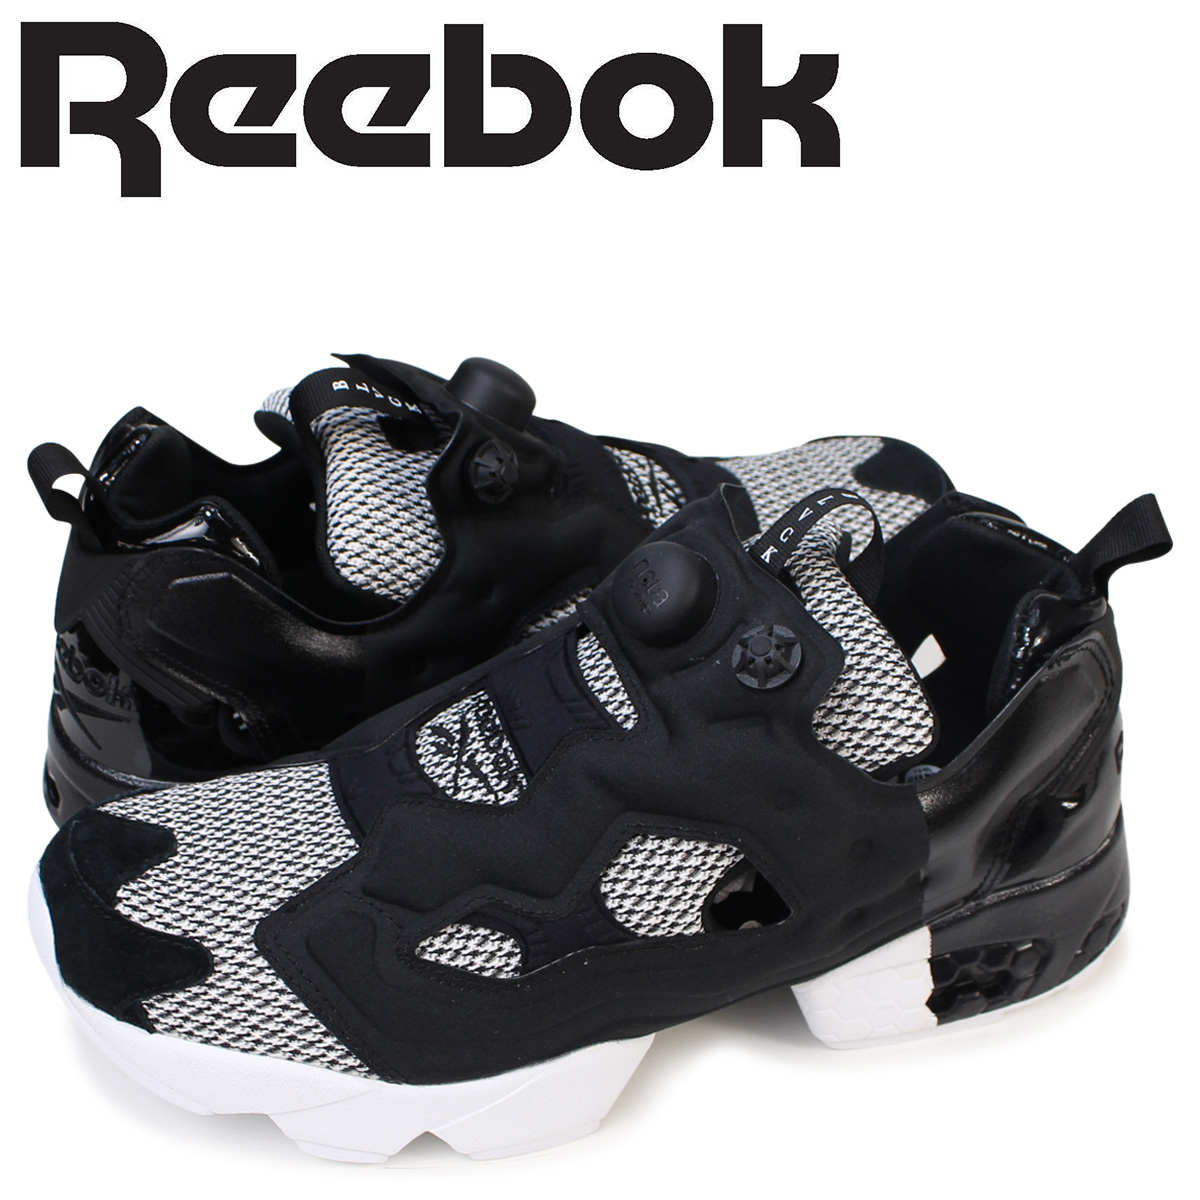 Whats Sports Insta リーボックポンプフューリースニーカー Up Reebok rUrwqPOF